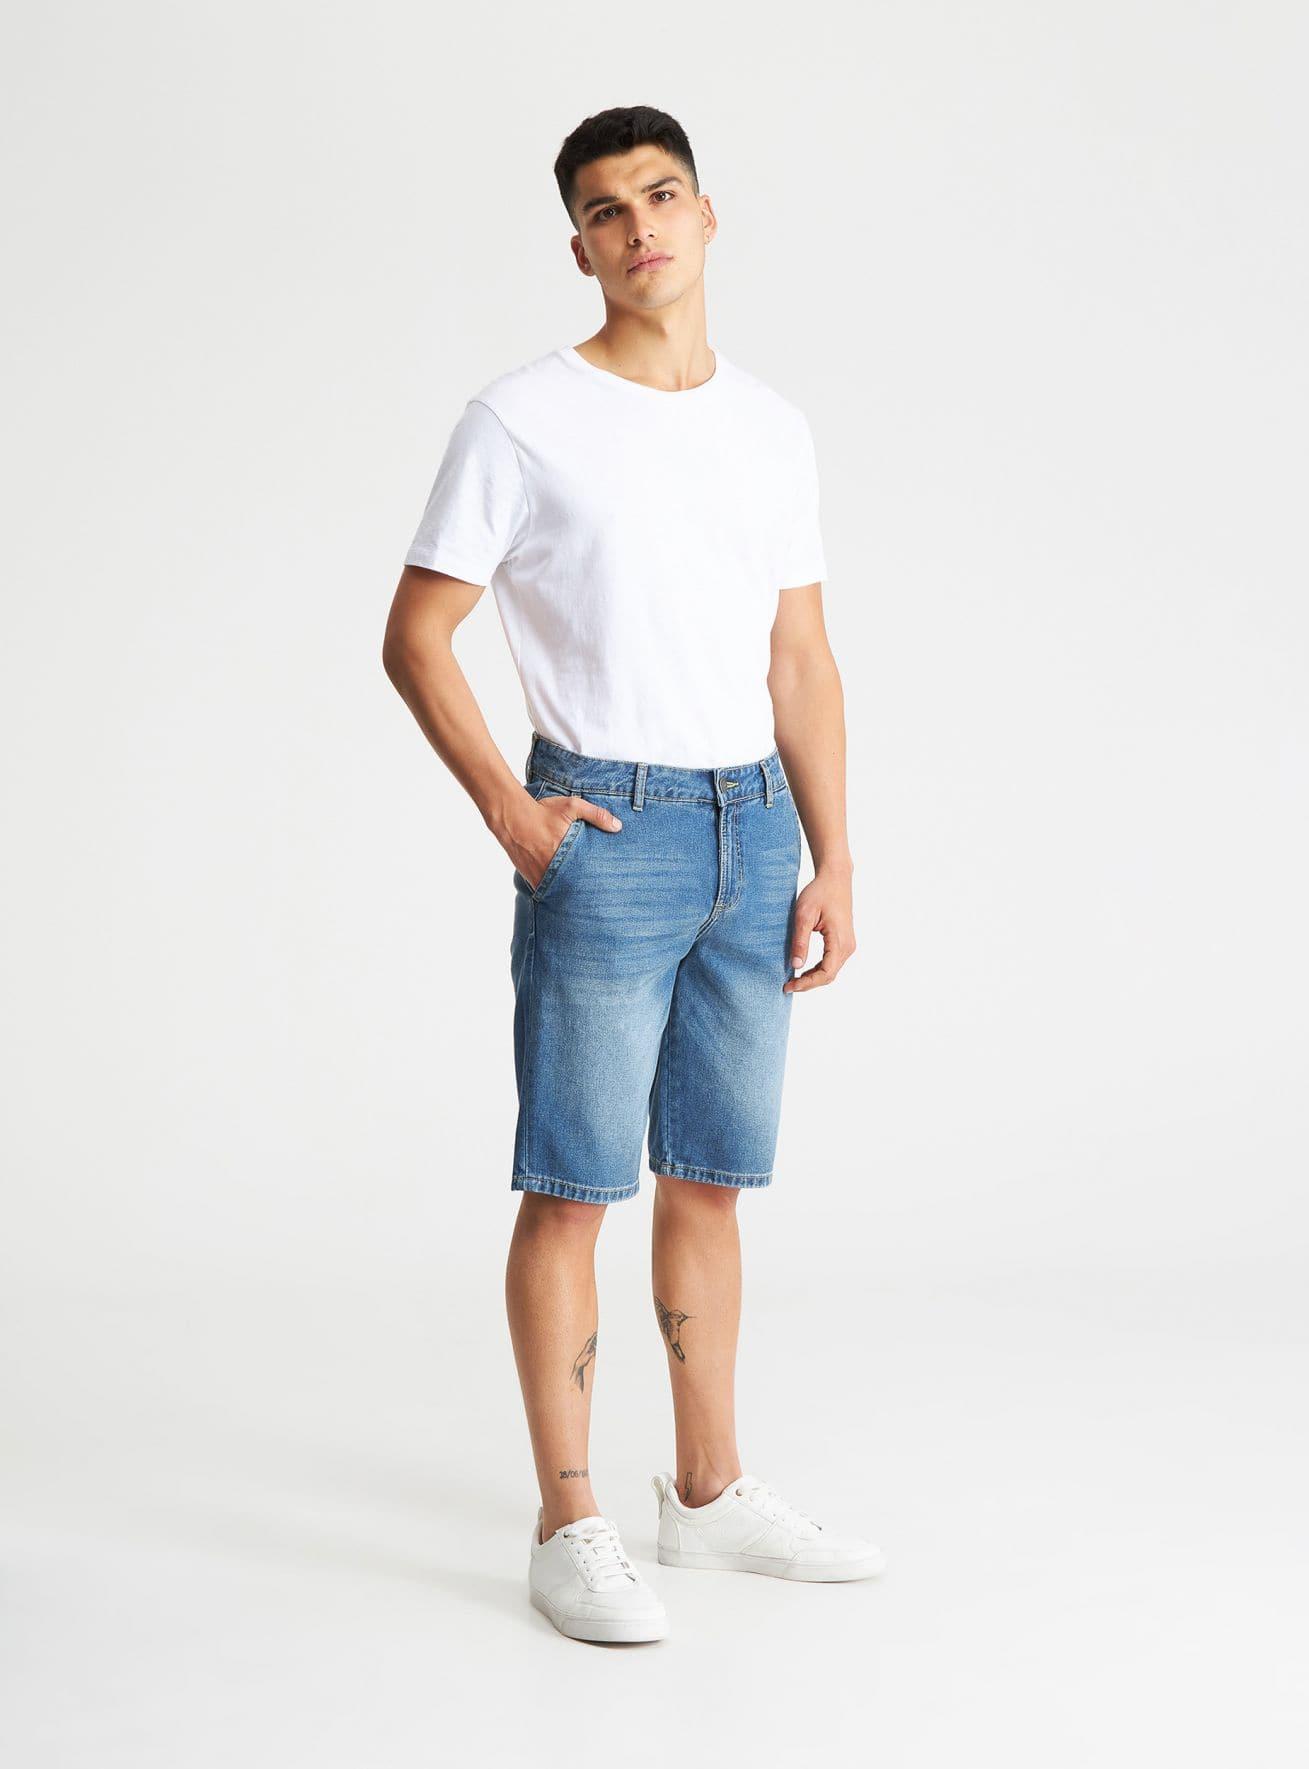 Pantalone Jeans Corto Hombre Terranova